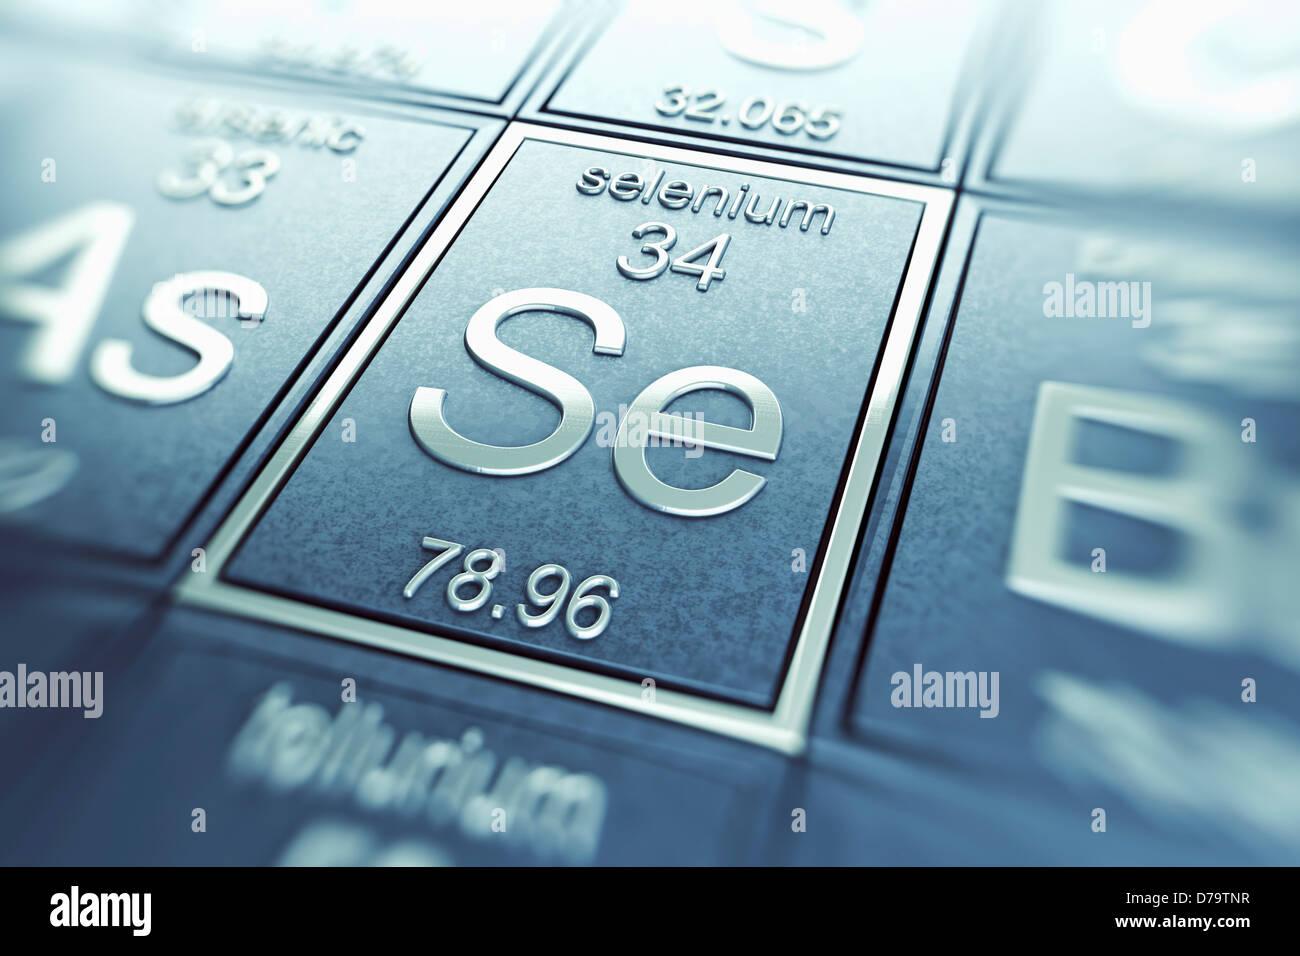 Selenium chemical element stock photo royalty free image selenium chemical element buycottarizona